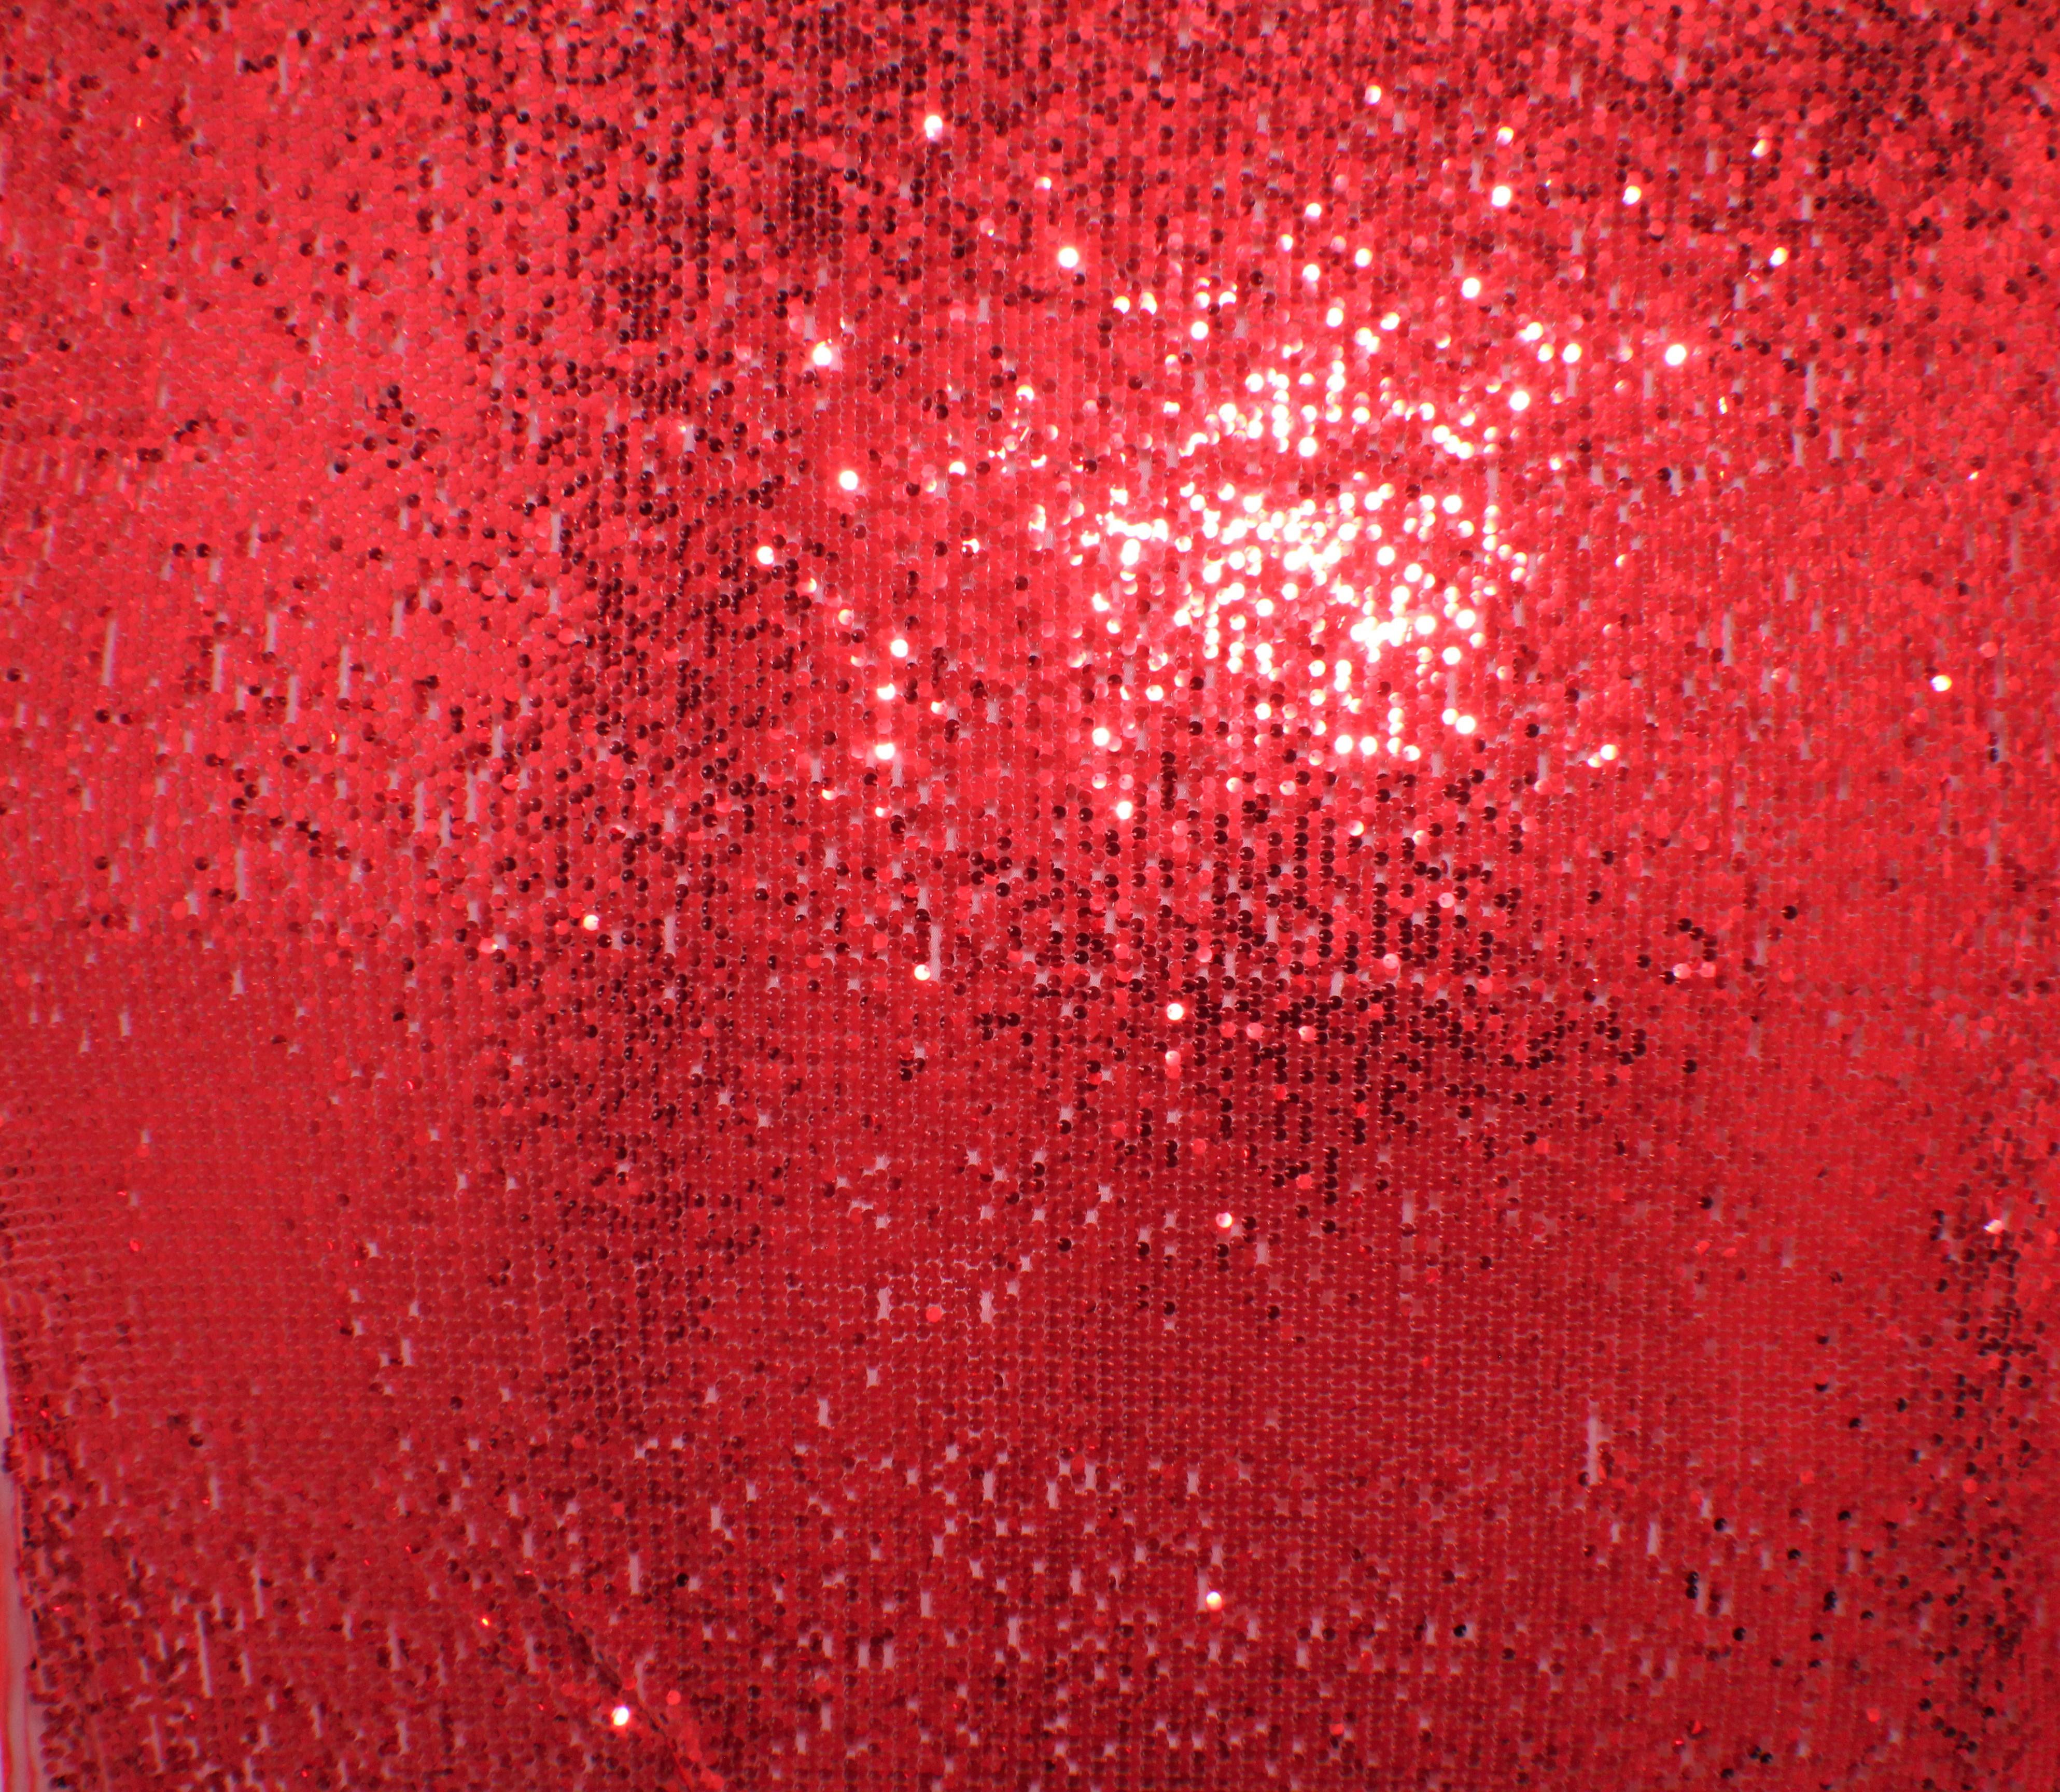 44 Red Sequin